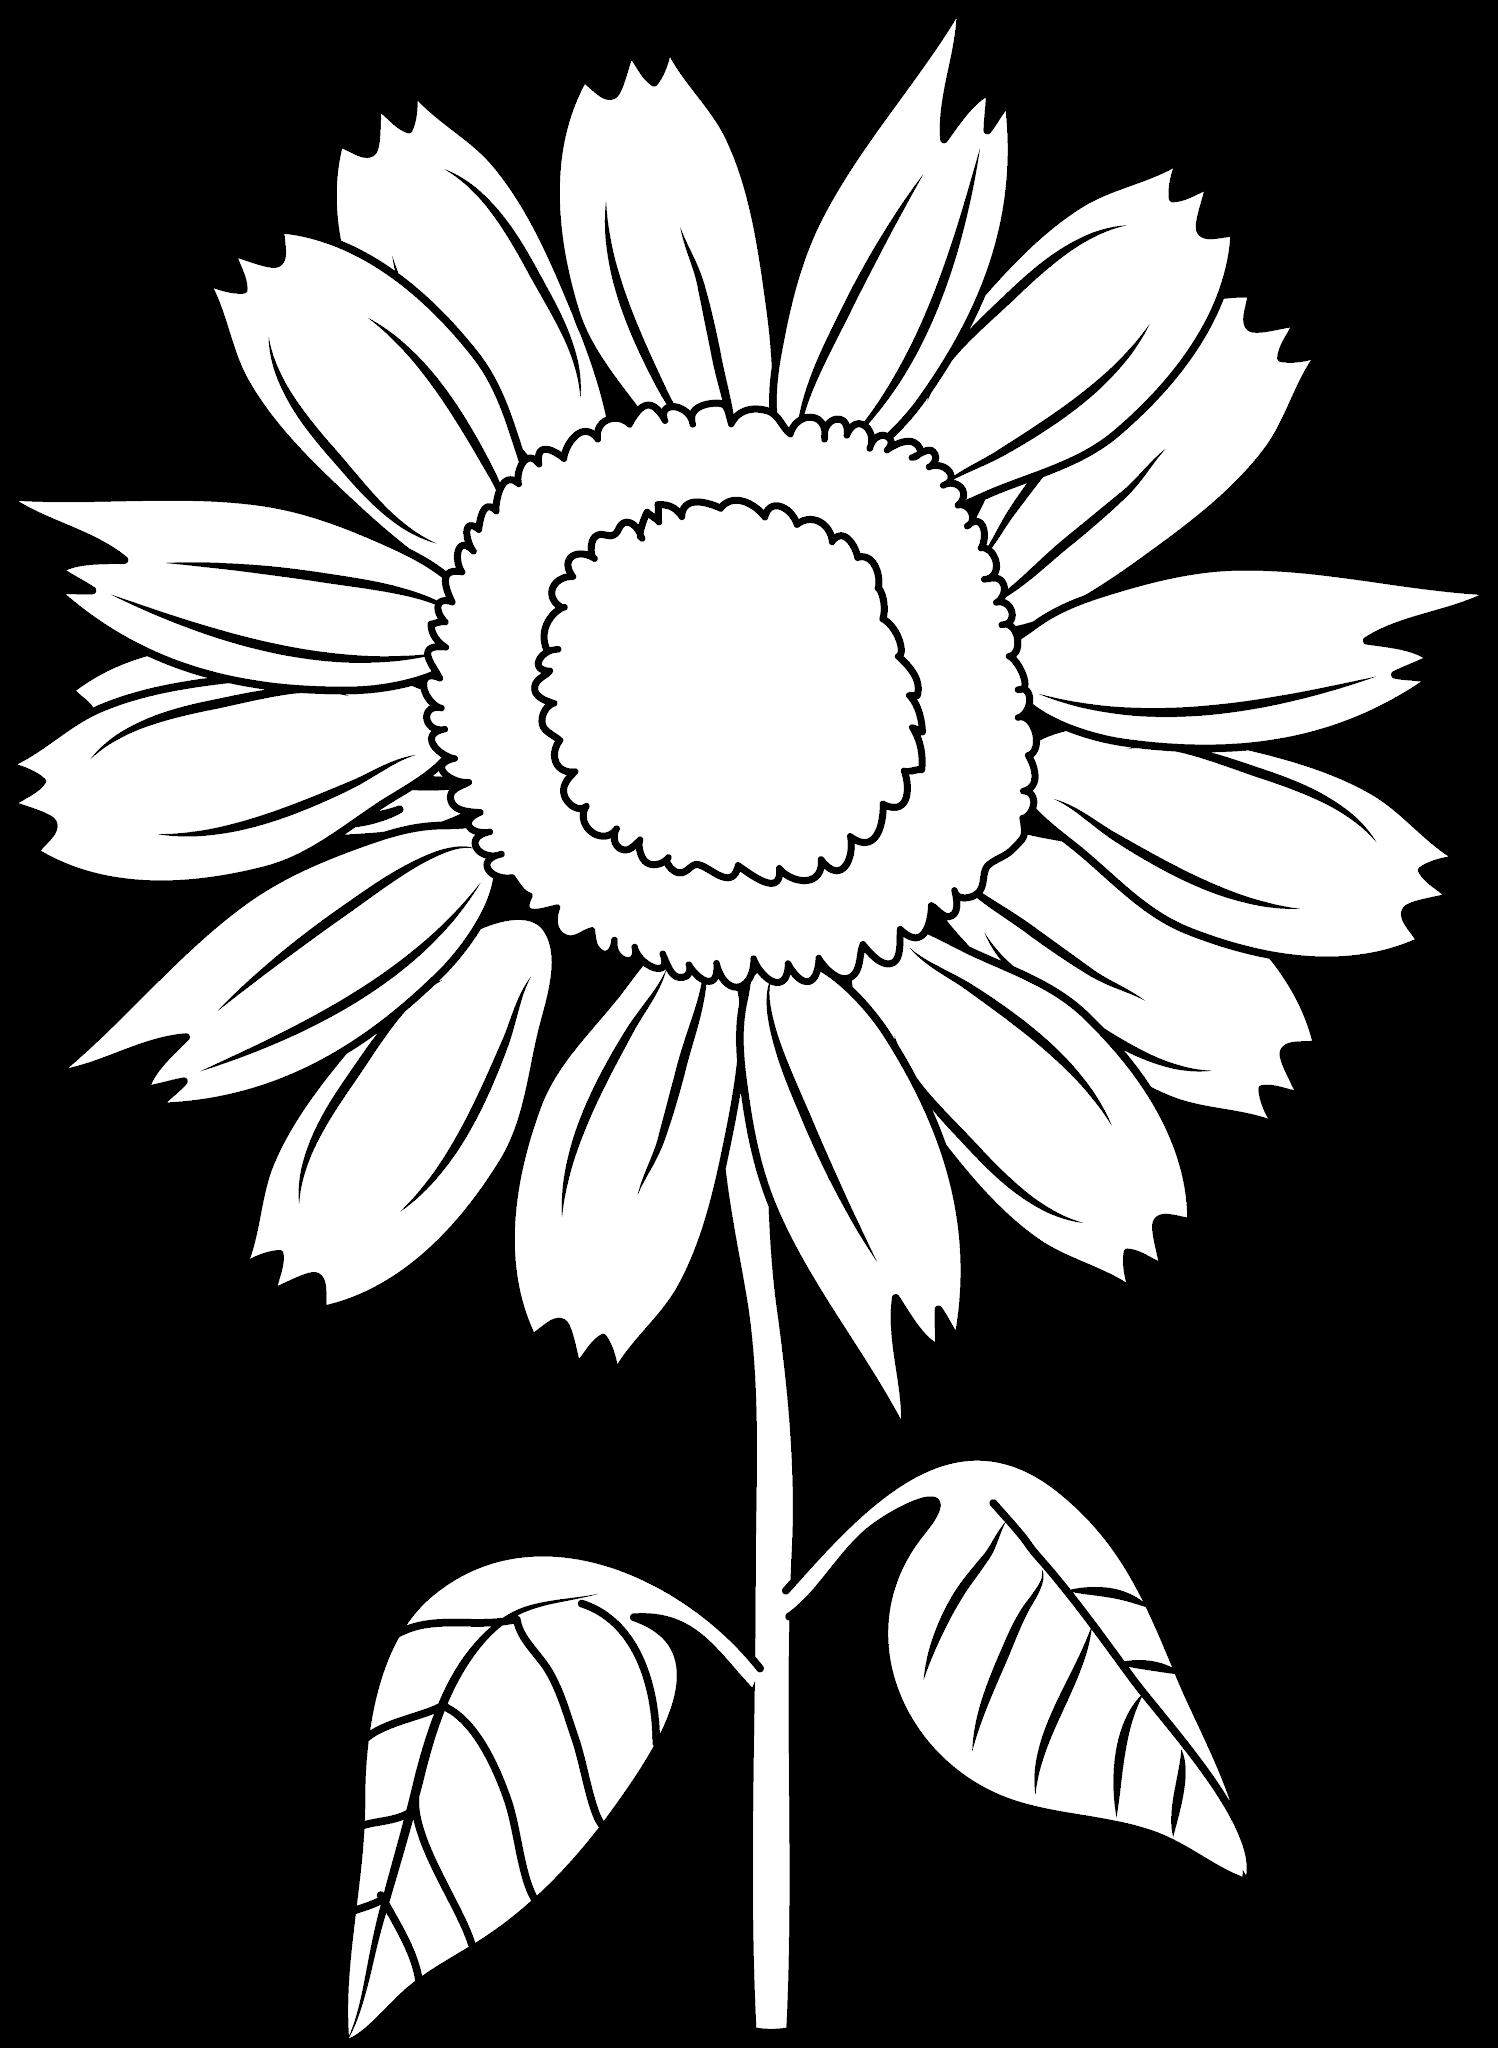 Common Sunflower Vector Sunflower Images Gallery Sunflower Coloring Pages Flower Coloring Pages Flower Drawing